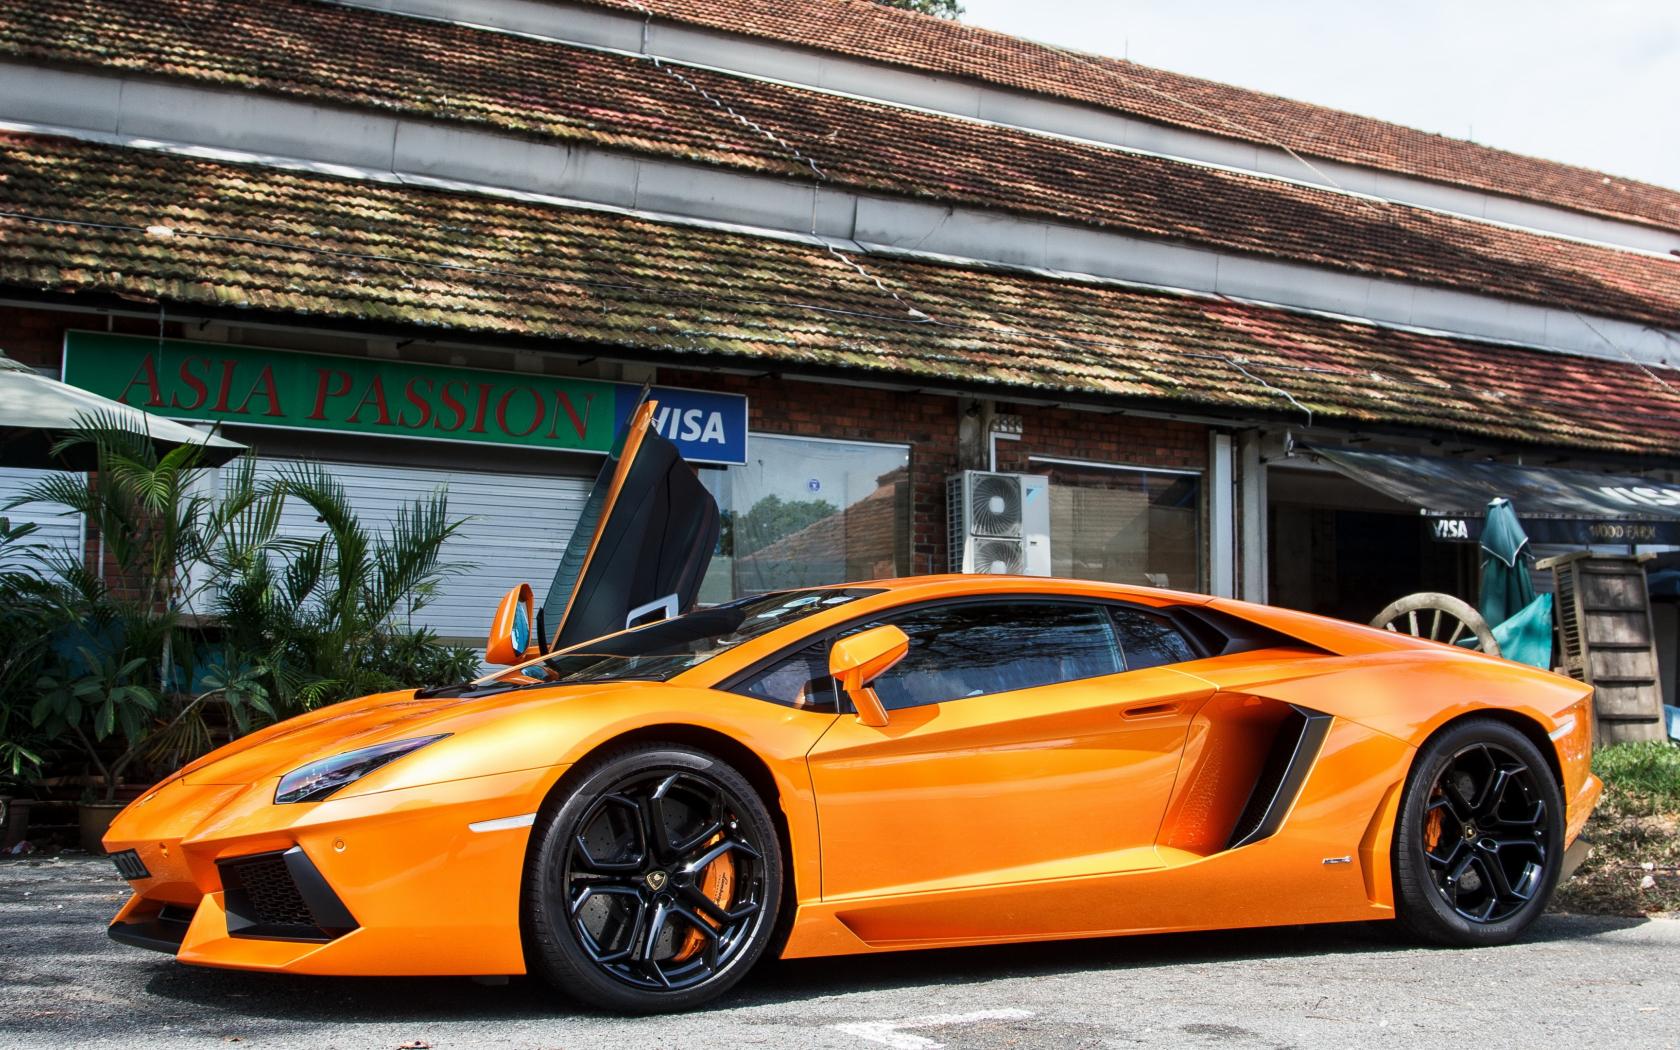 Free download Ultra Hd 4K Cars Wallpapers Desktop ...